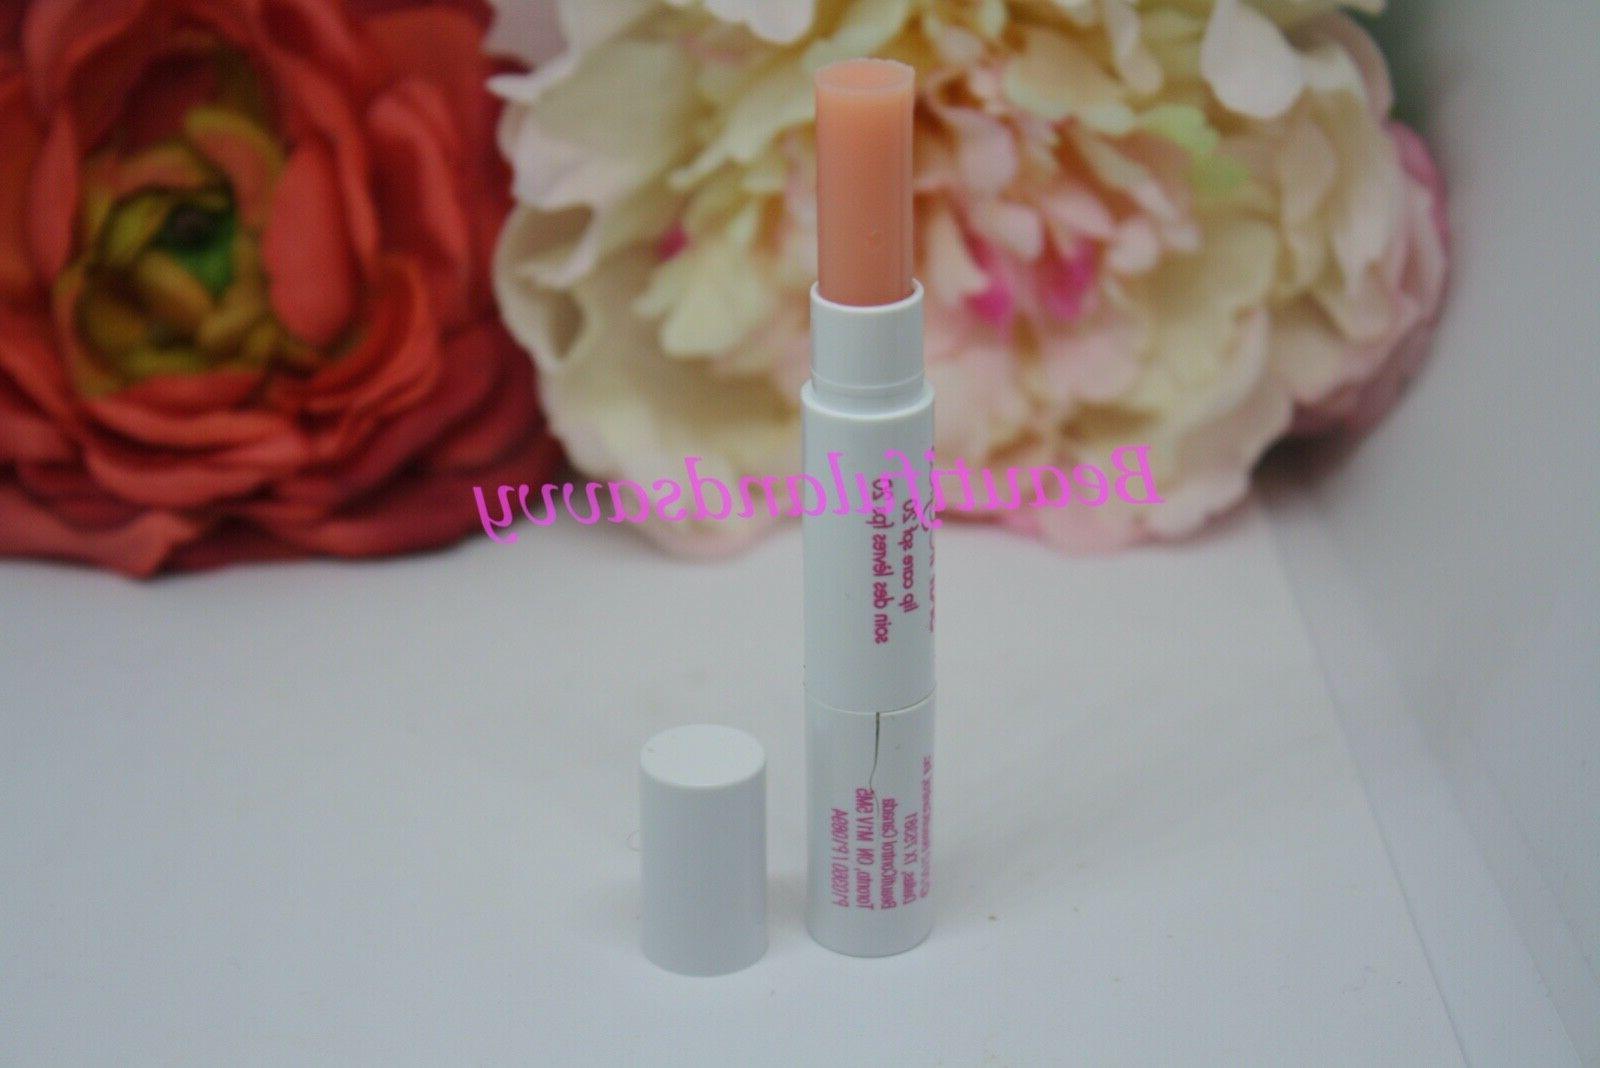 BeautiControl Skinlogics Lip SPF Please Read